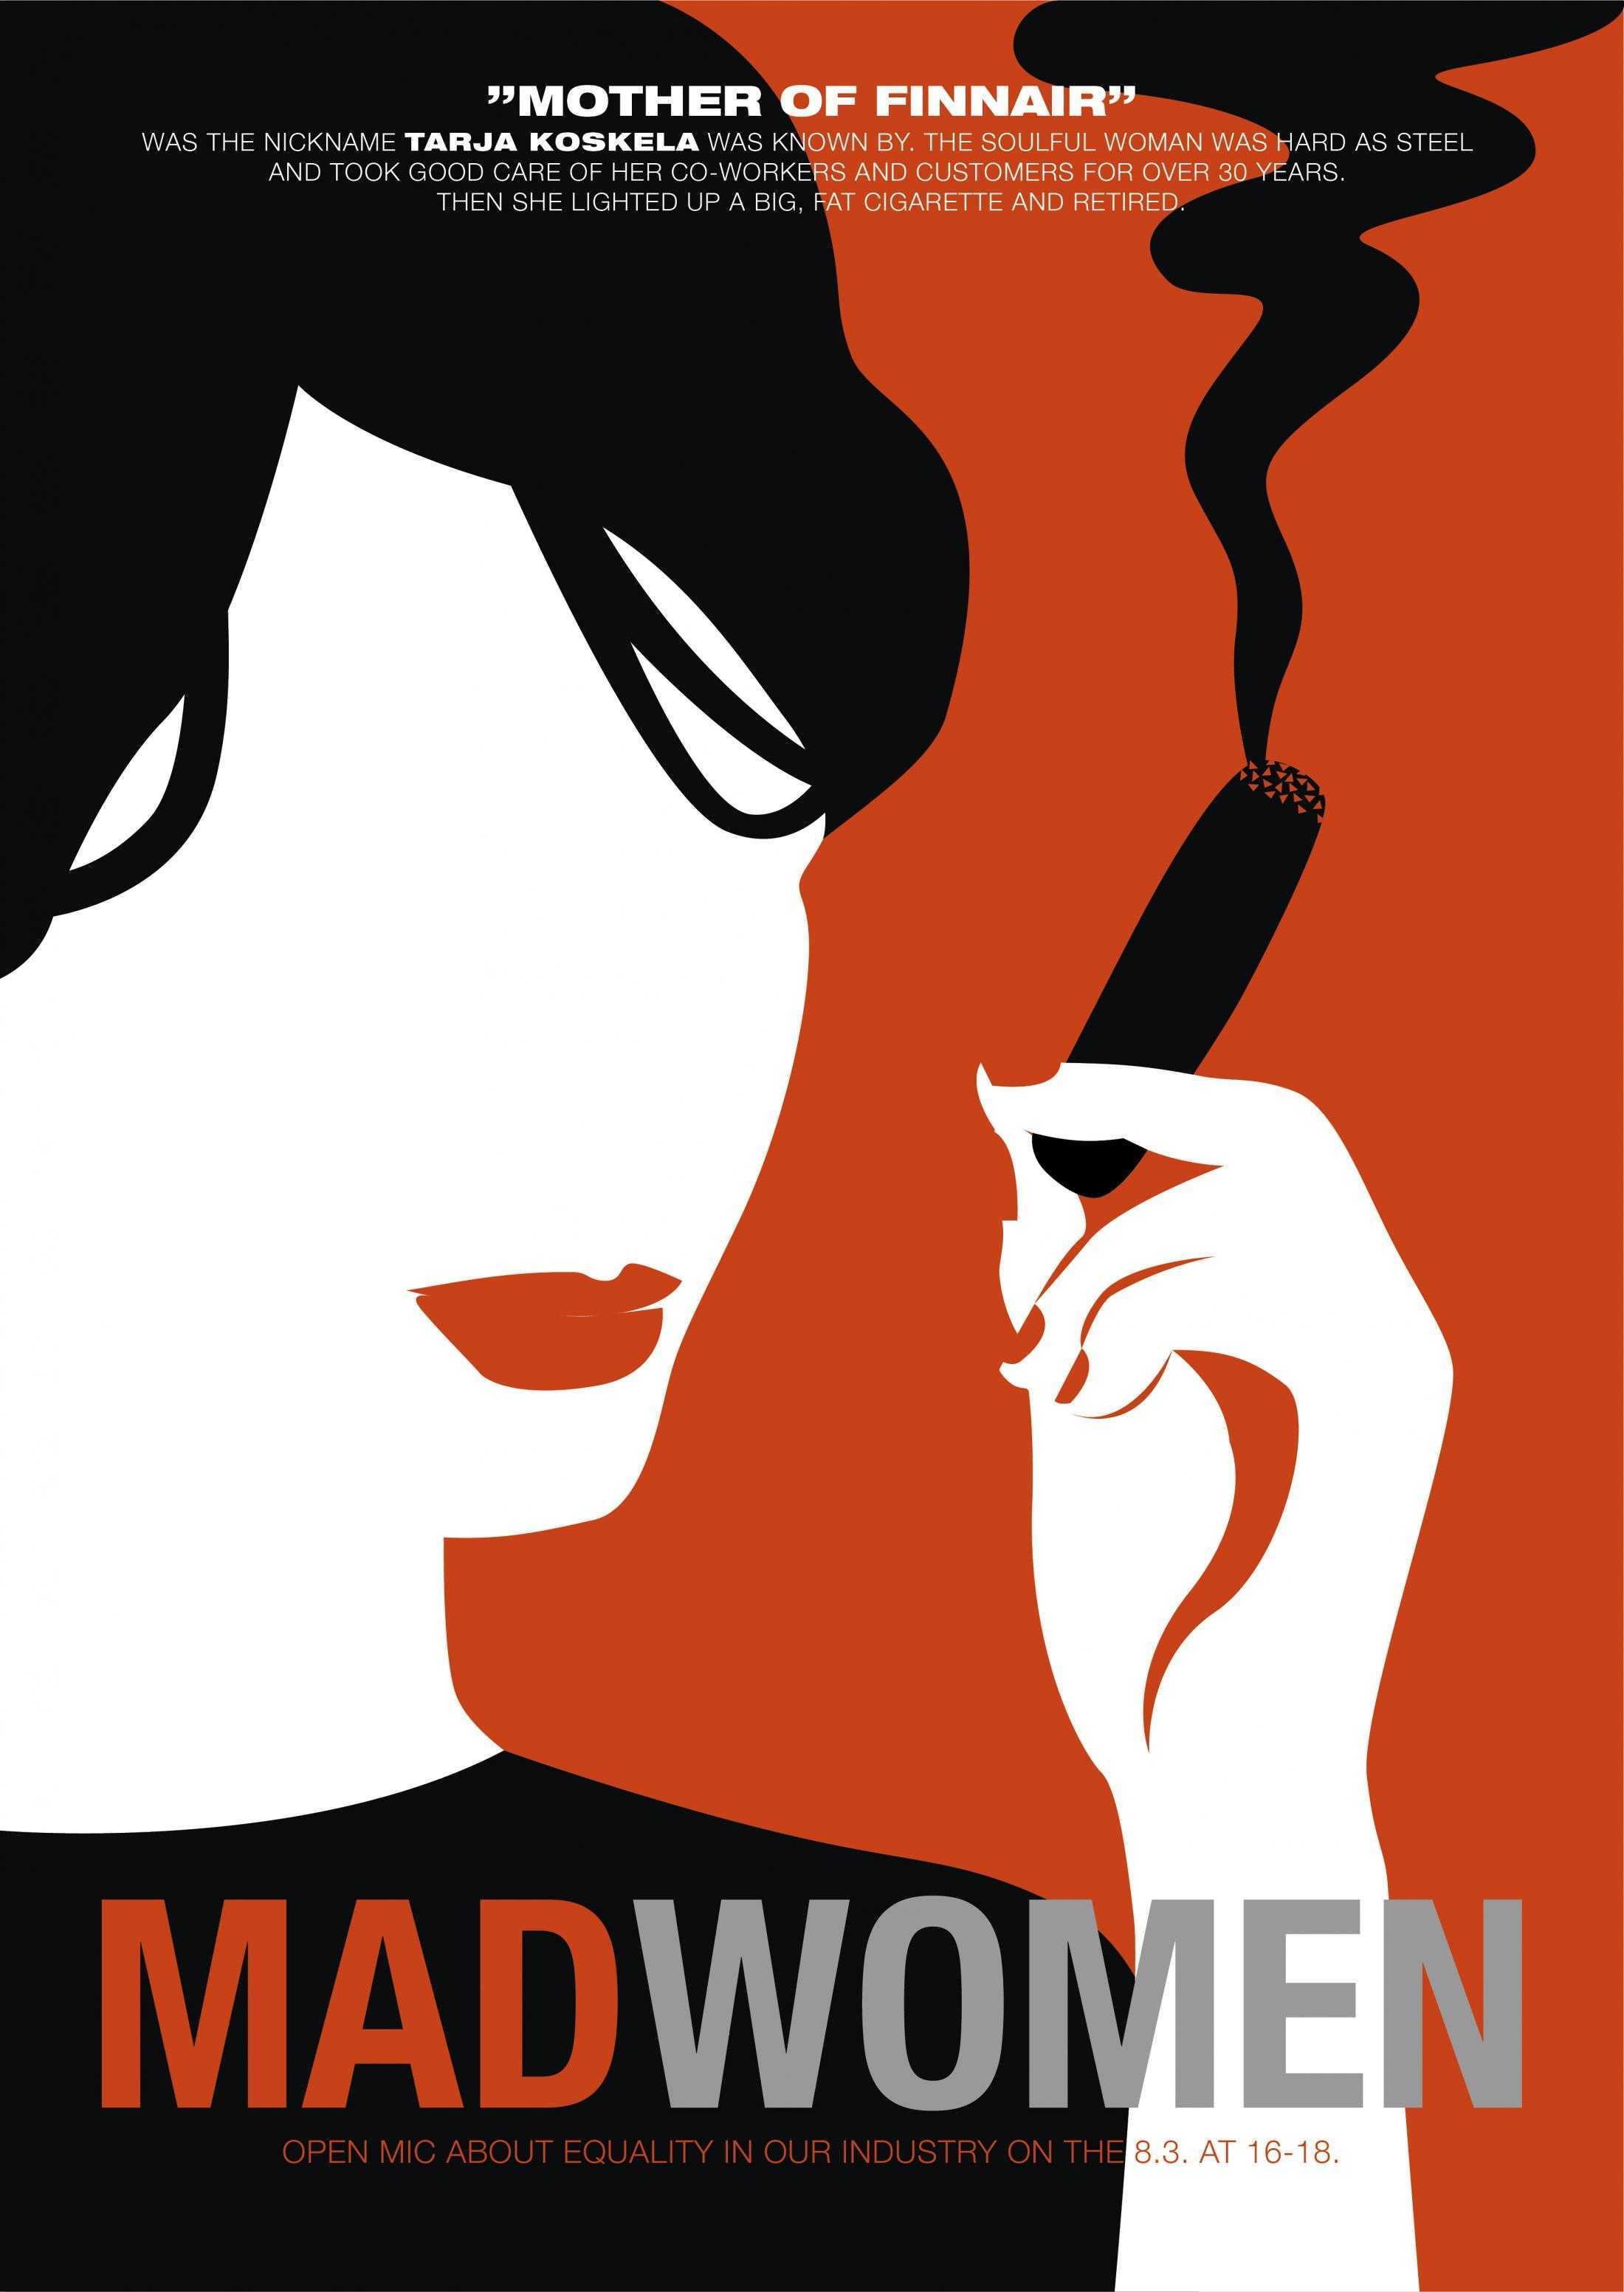 mad_women_by_sek_tarja_kaskela_poster